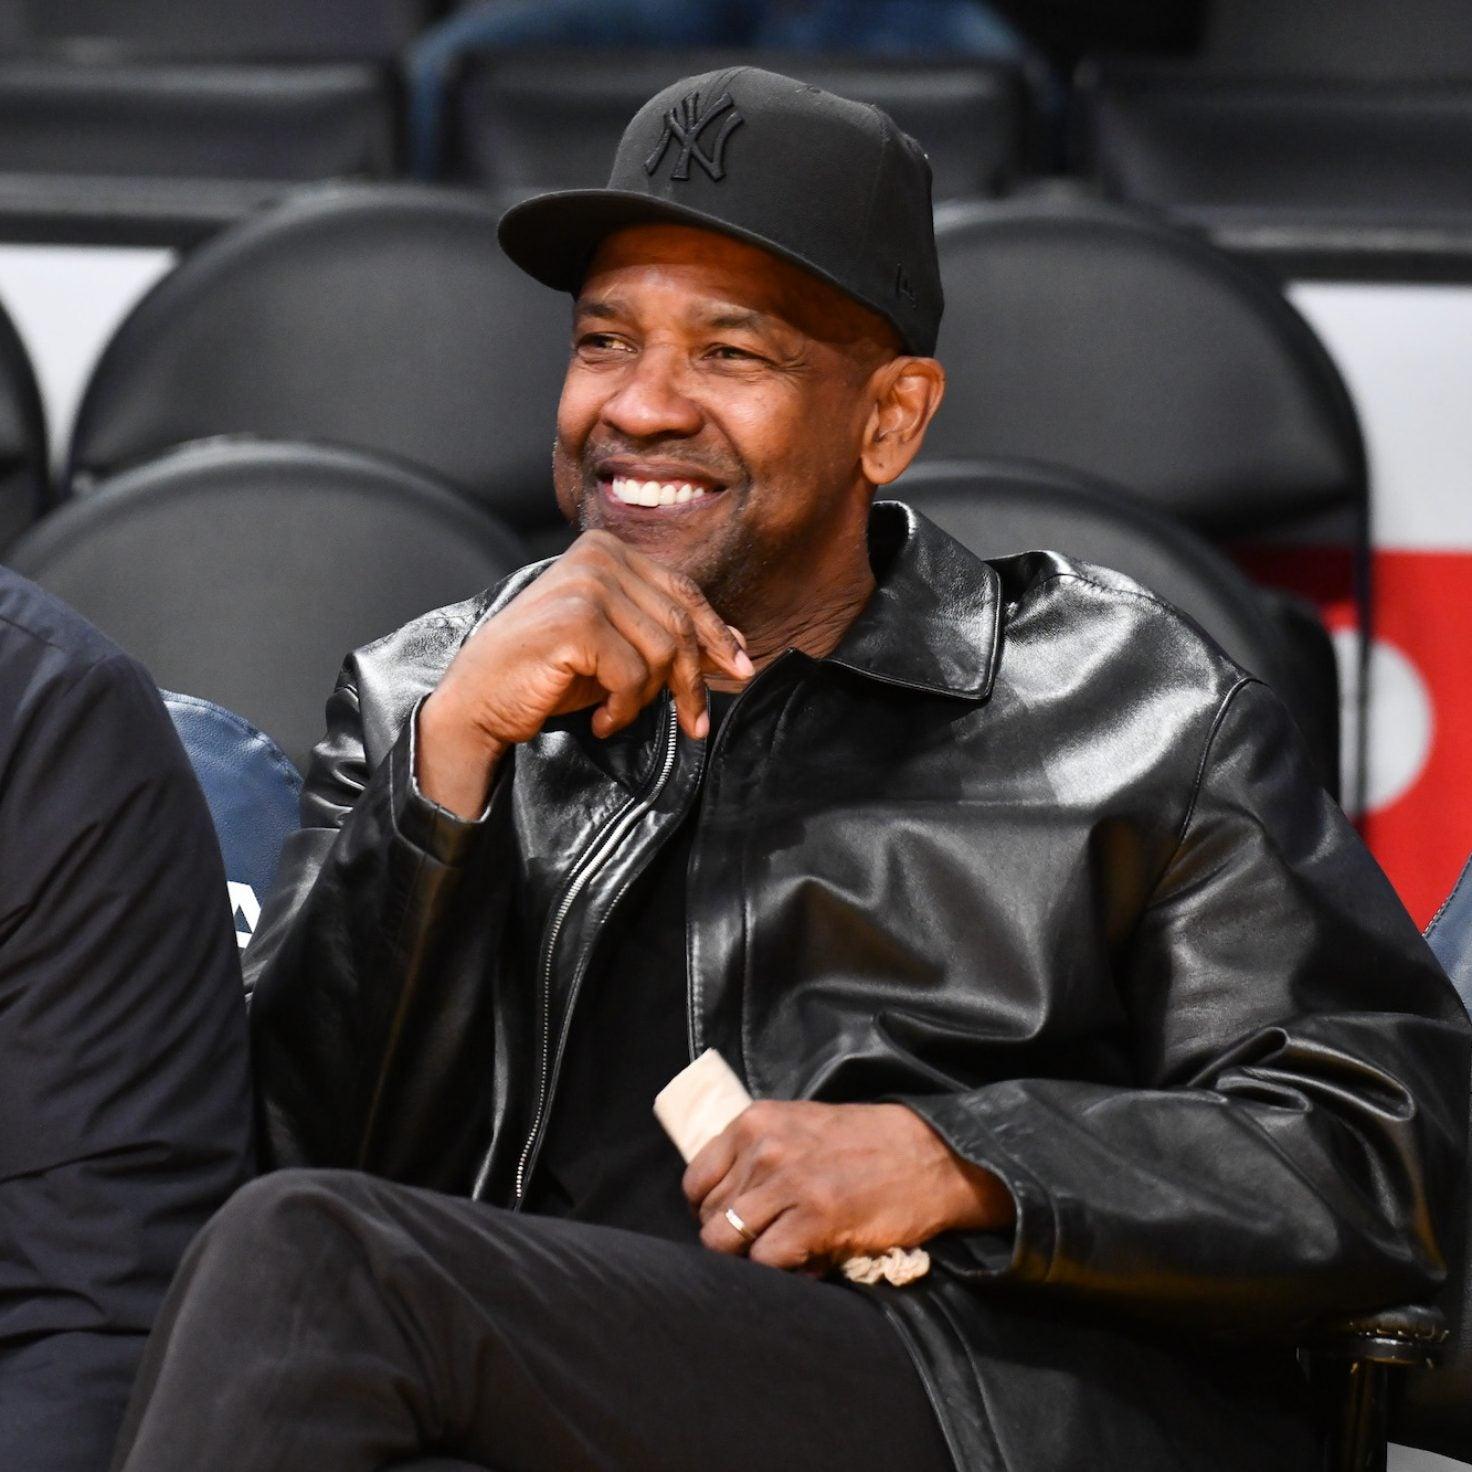 Denzel Washington Helps Homeless Man Walking In Los Angeles Traffic